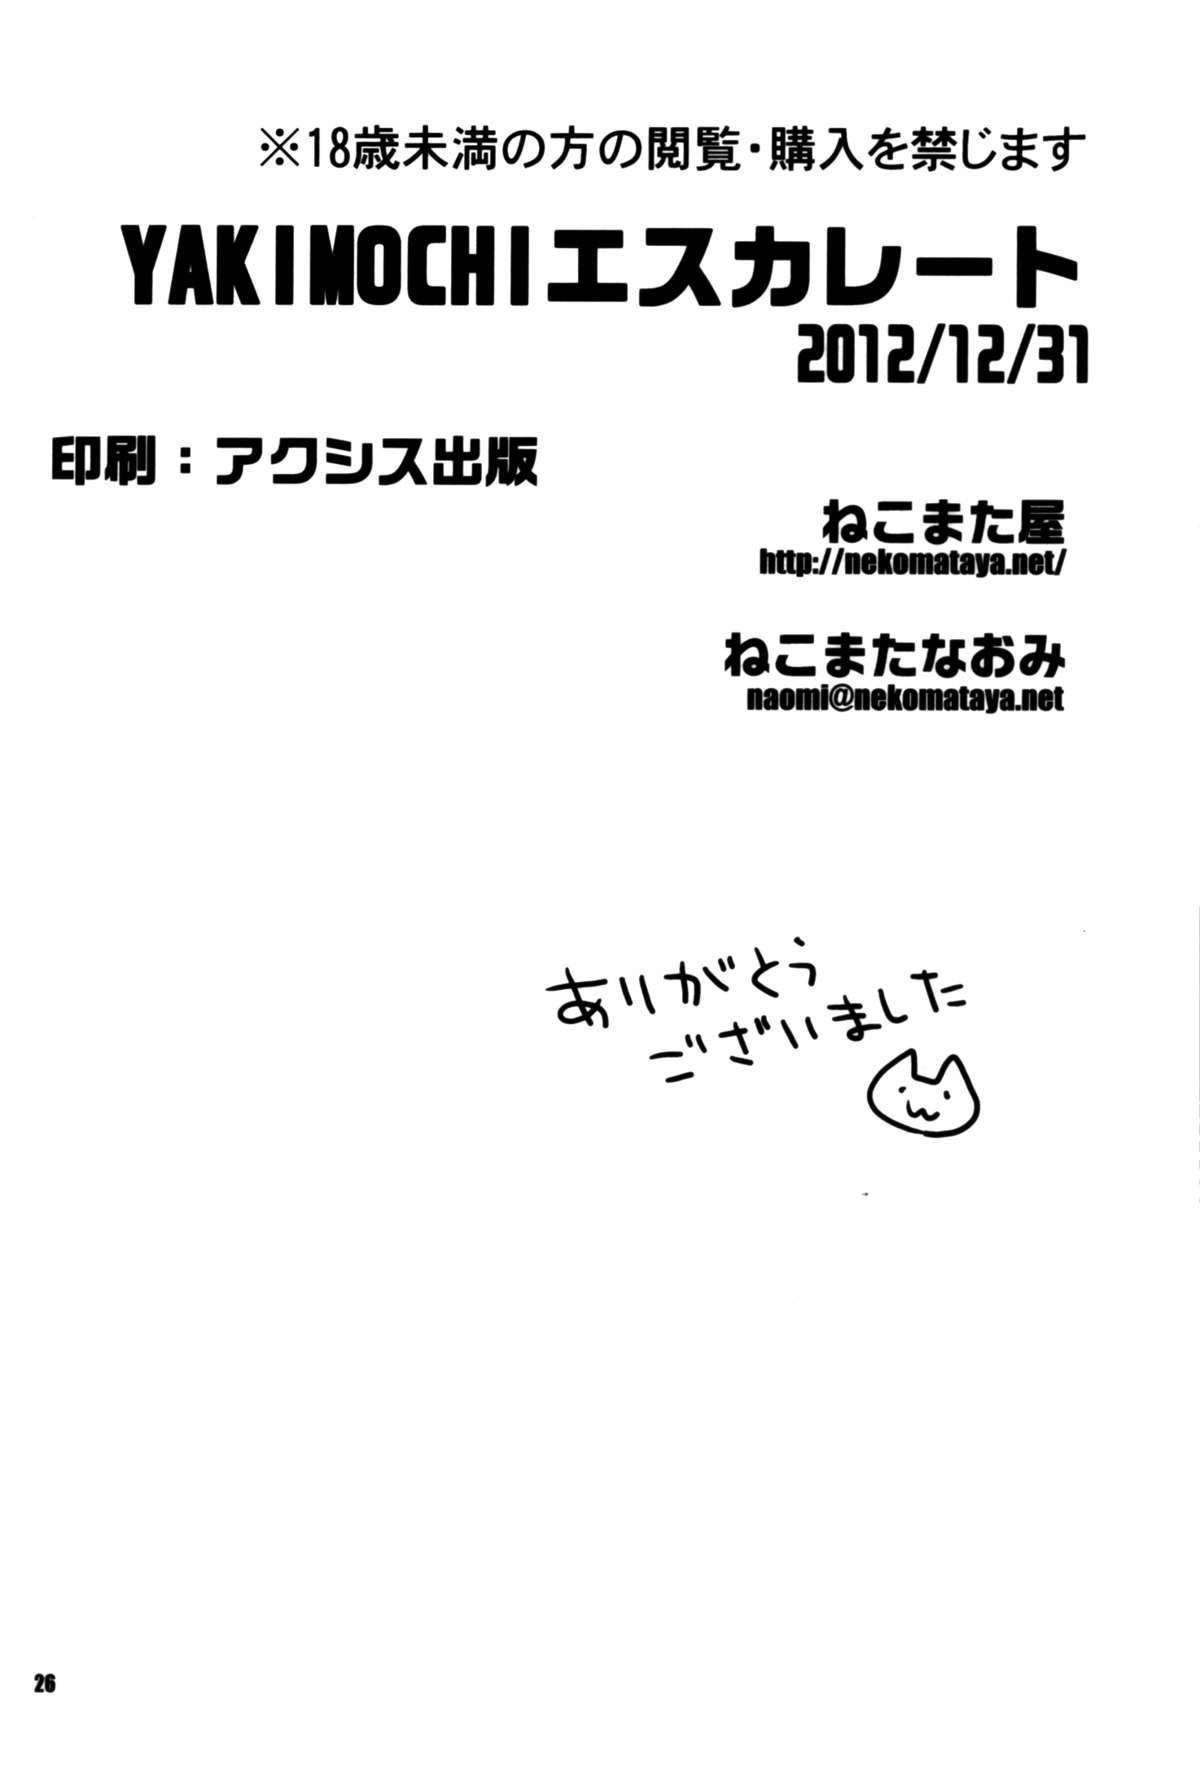 YAKIMOCHI Escalate 24